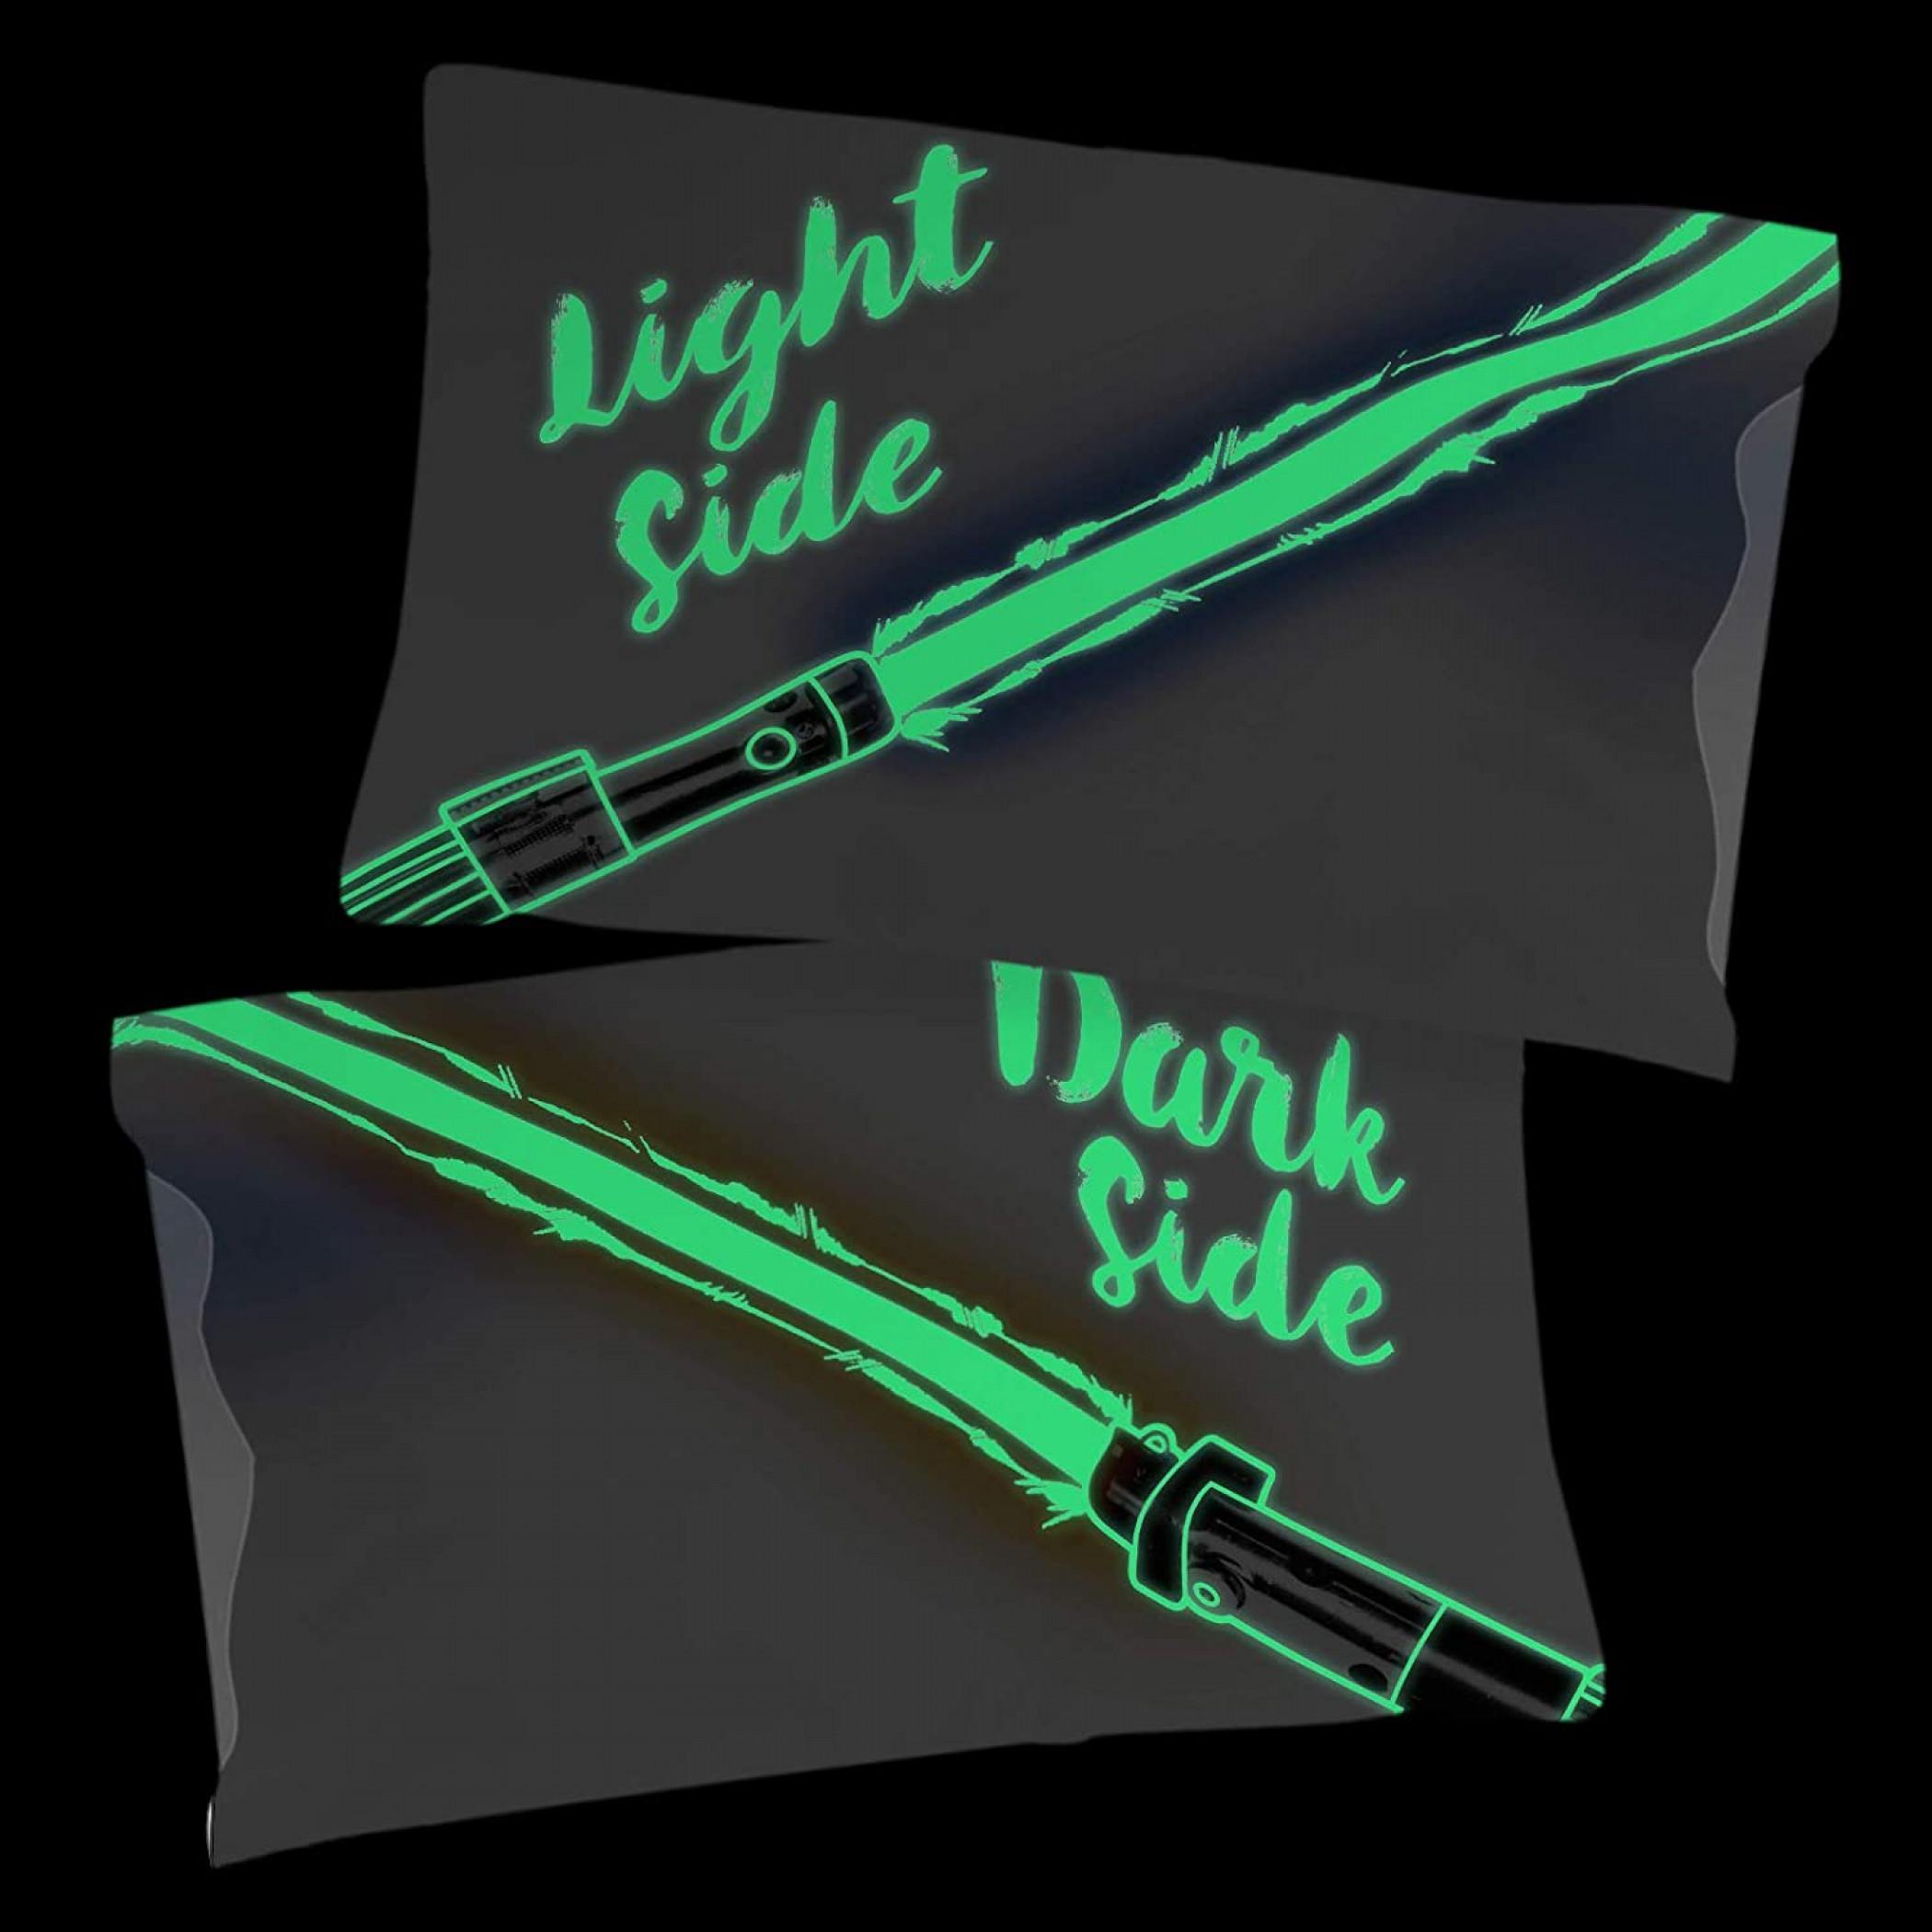 Star Wars Light/Dark Side Glow in the Dark Pillowcase 2-Pack